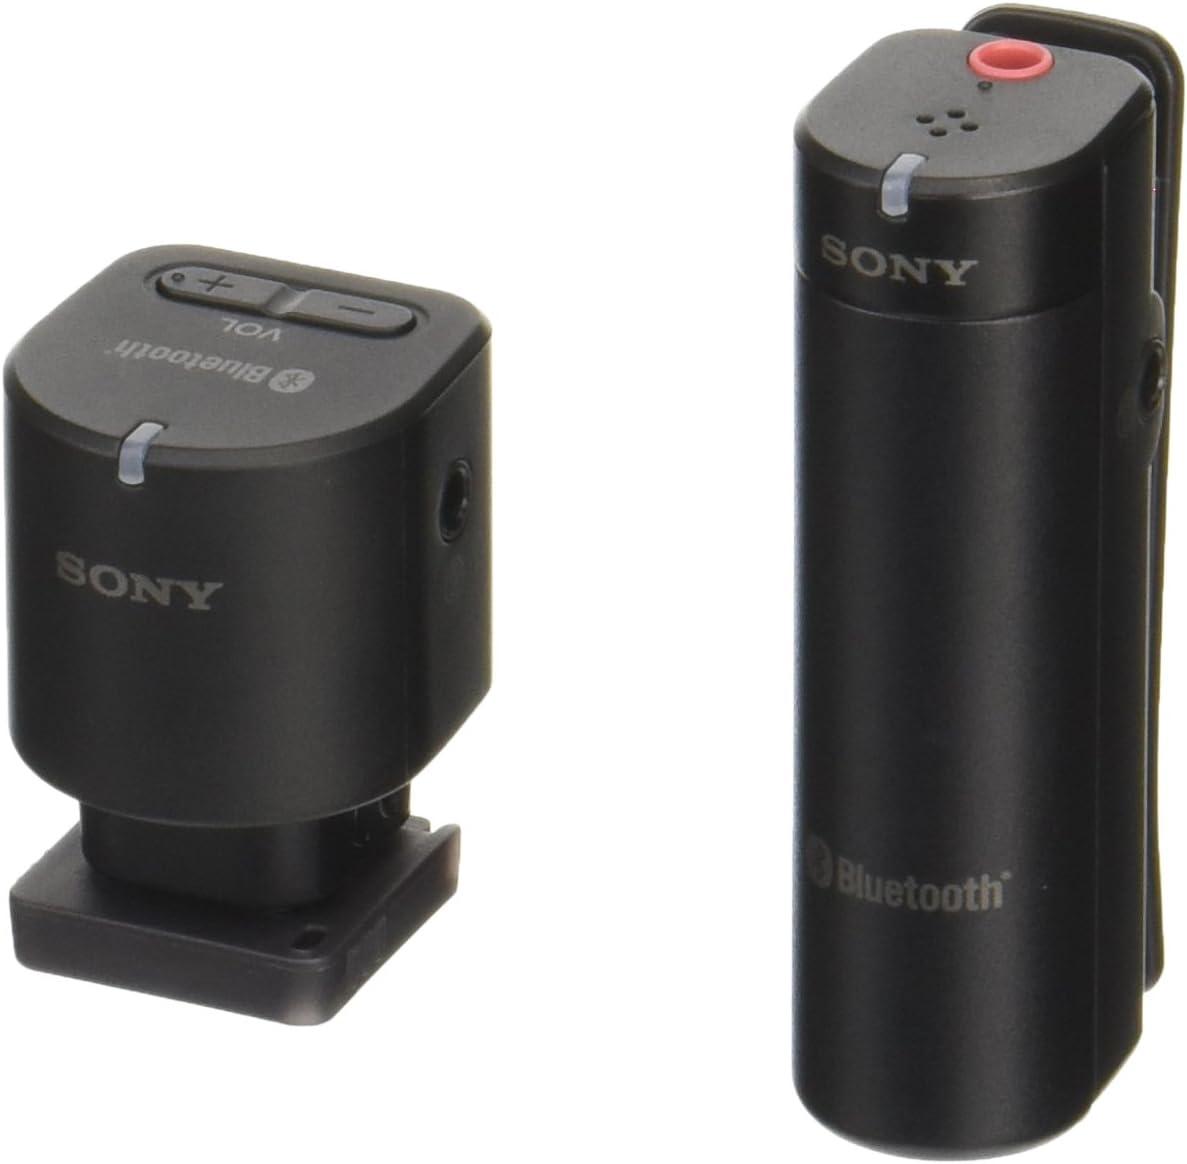 Sony ECM-W1M Bluetooth Wireless Microphone System for HandyCam Camcorder